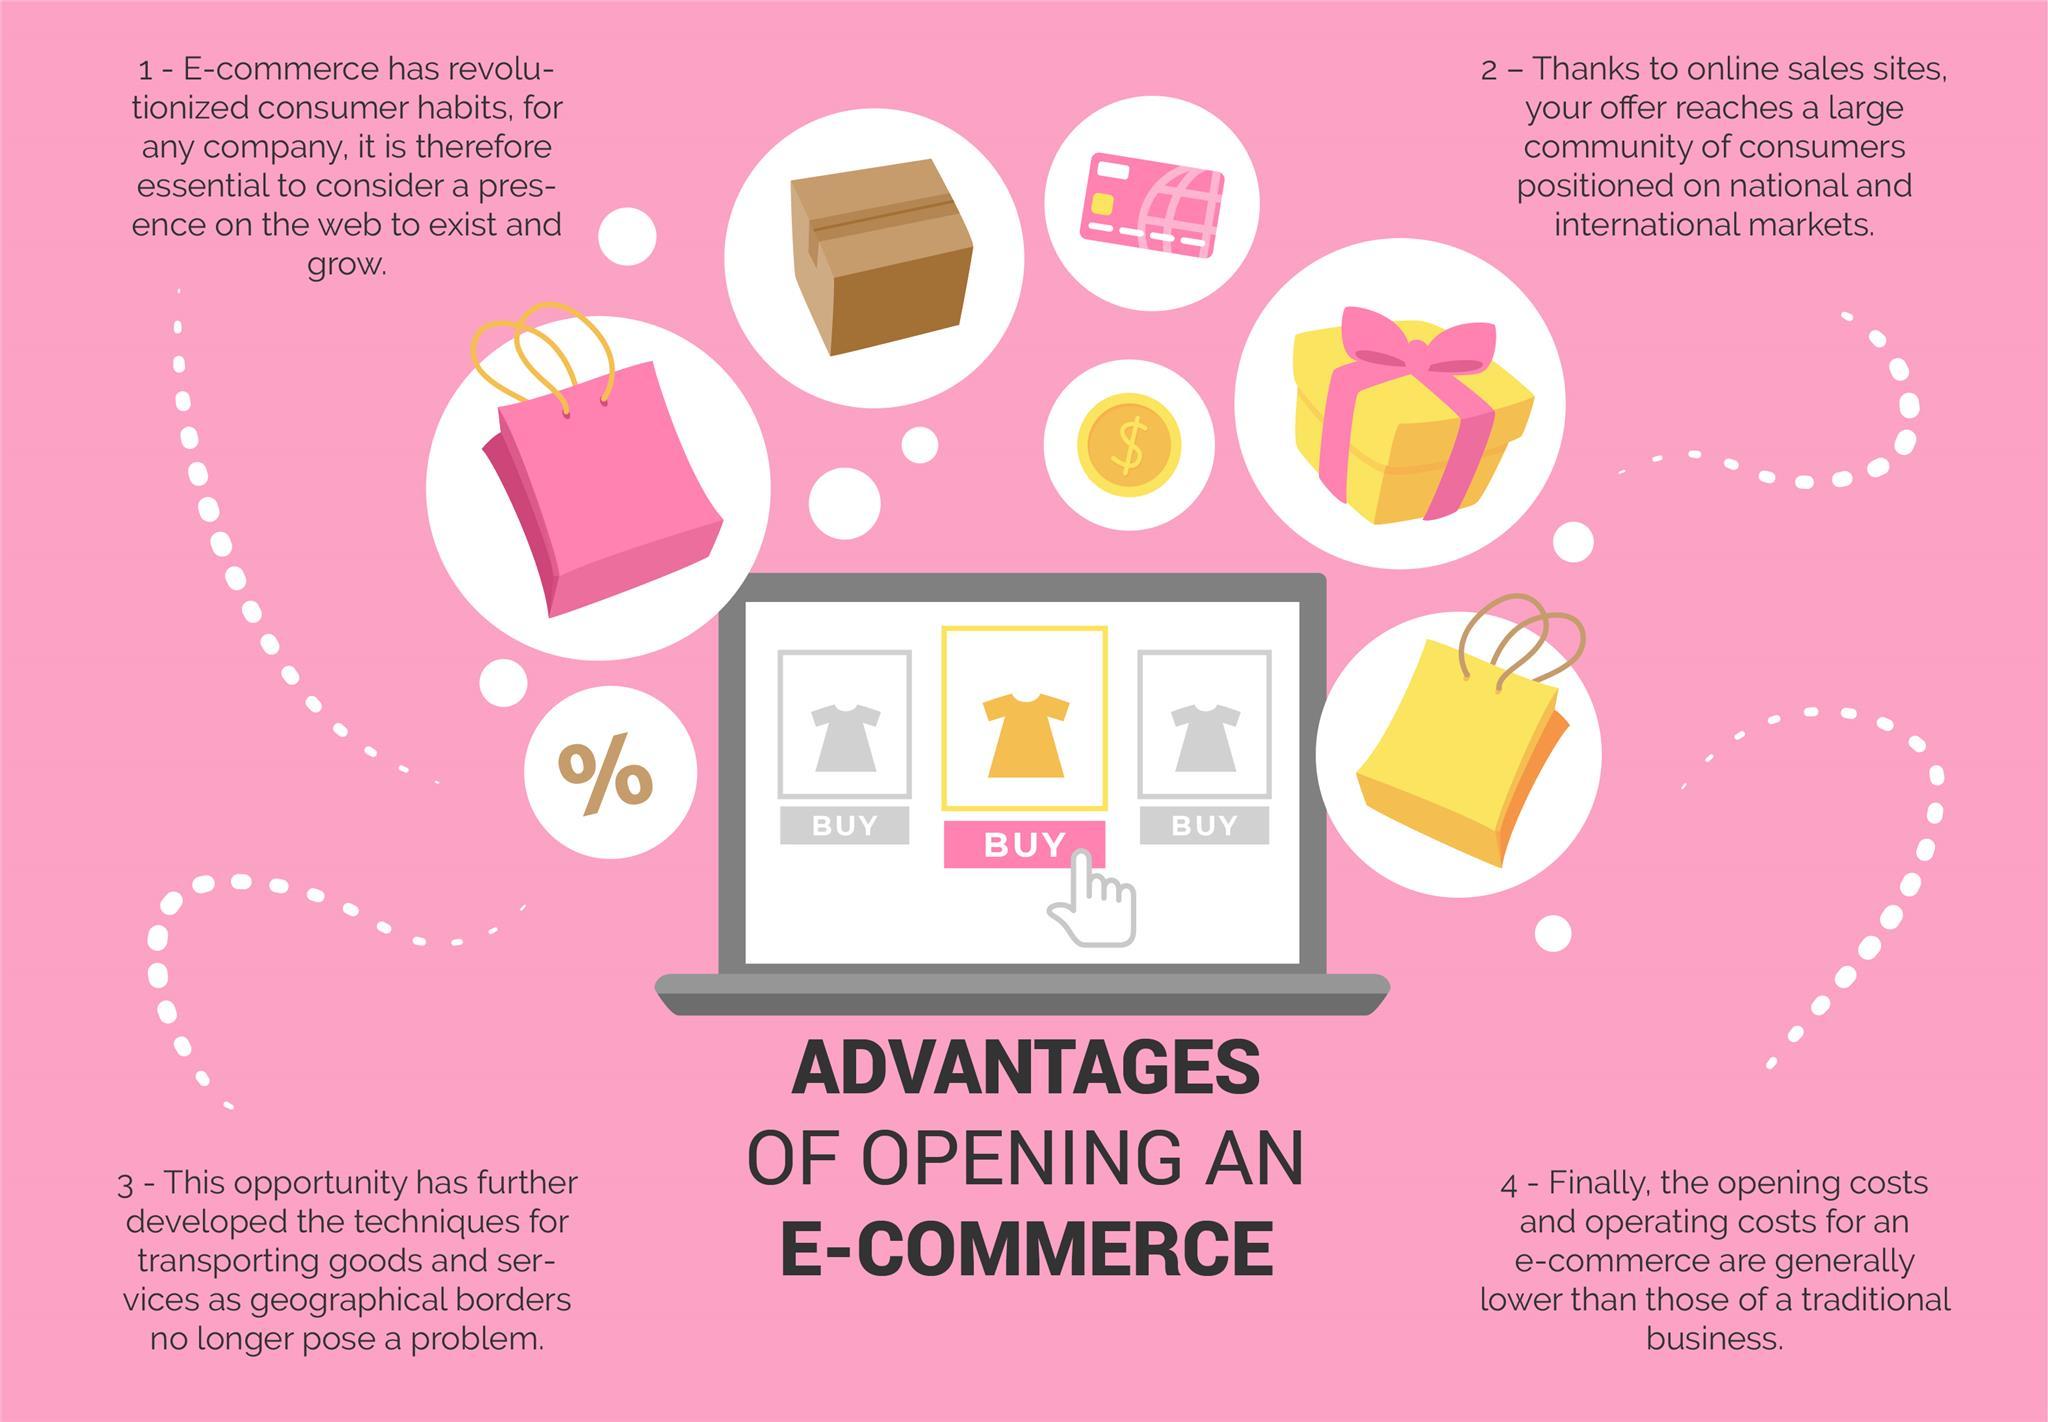 Advantages of ecommerce